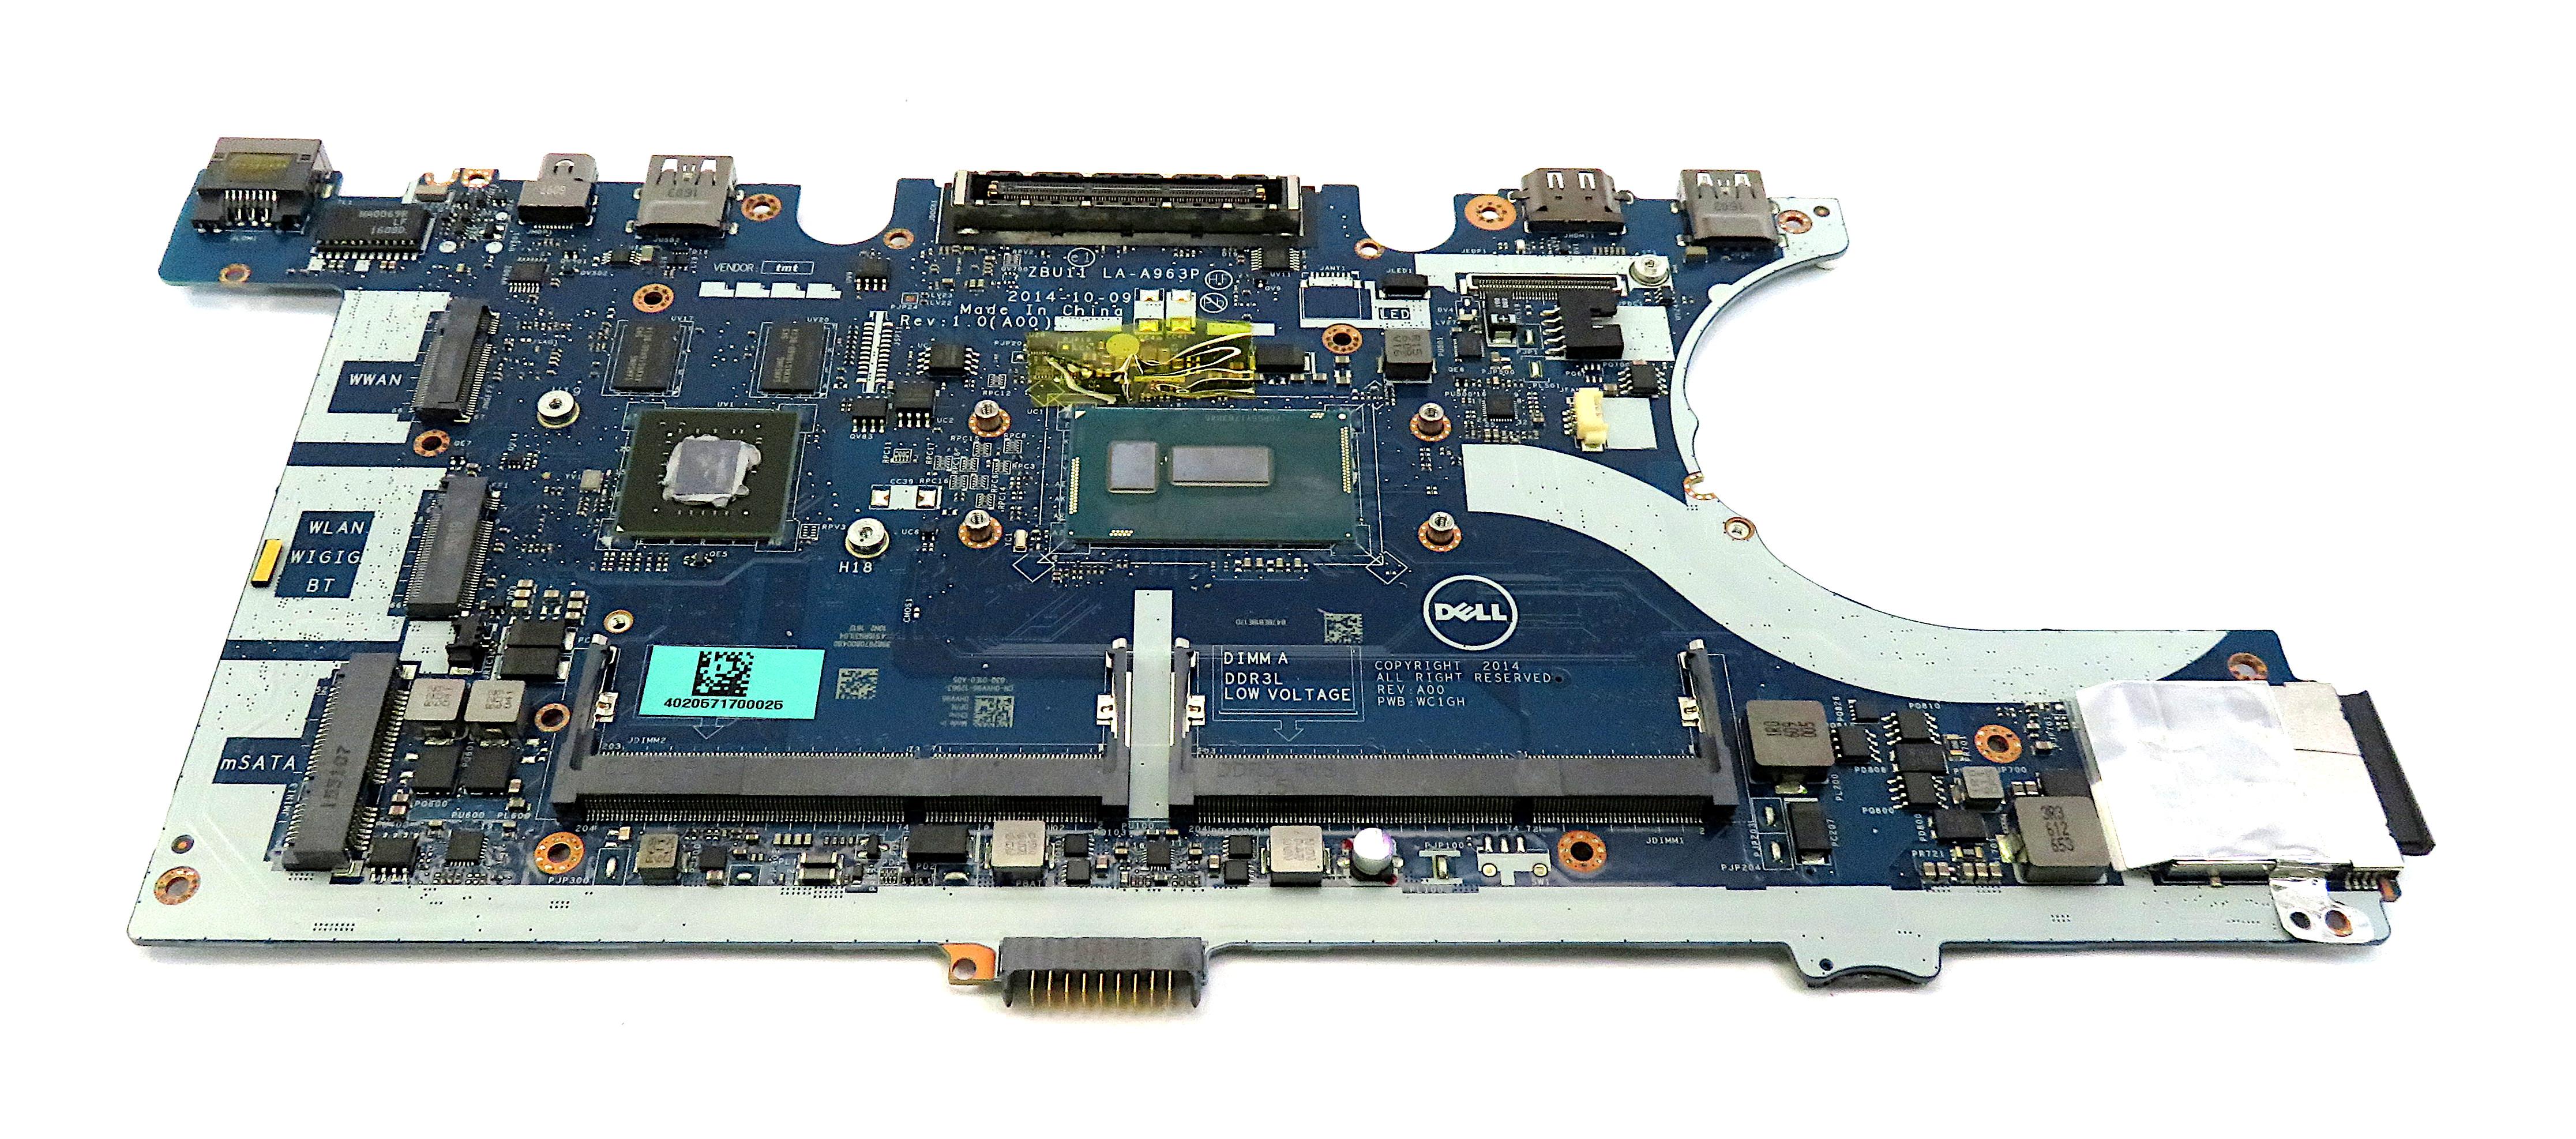 Dell HVV96 Latitude E7450 with Intel Core i5-5300U Laptop Motherboard